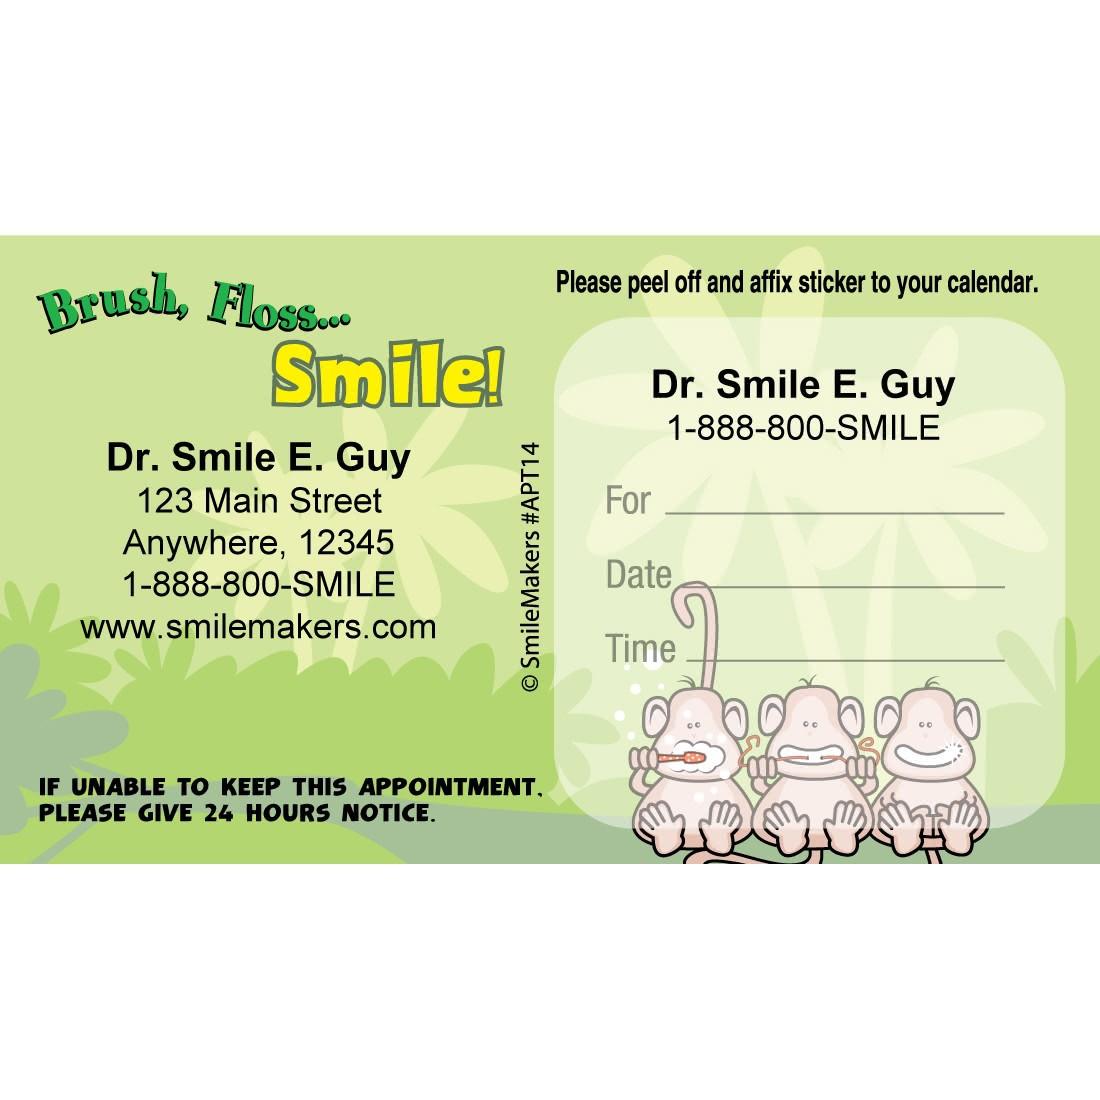 Custom BrushFlossSmile Monkey Appointment Cards [image]